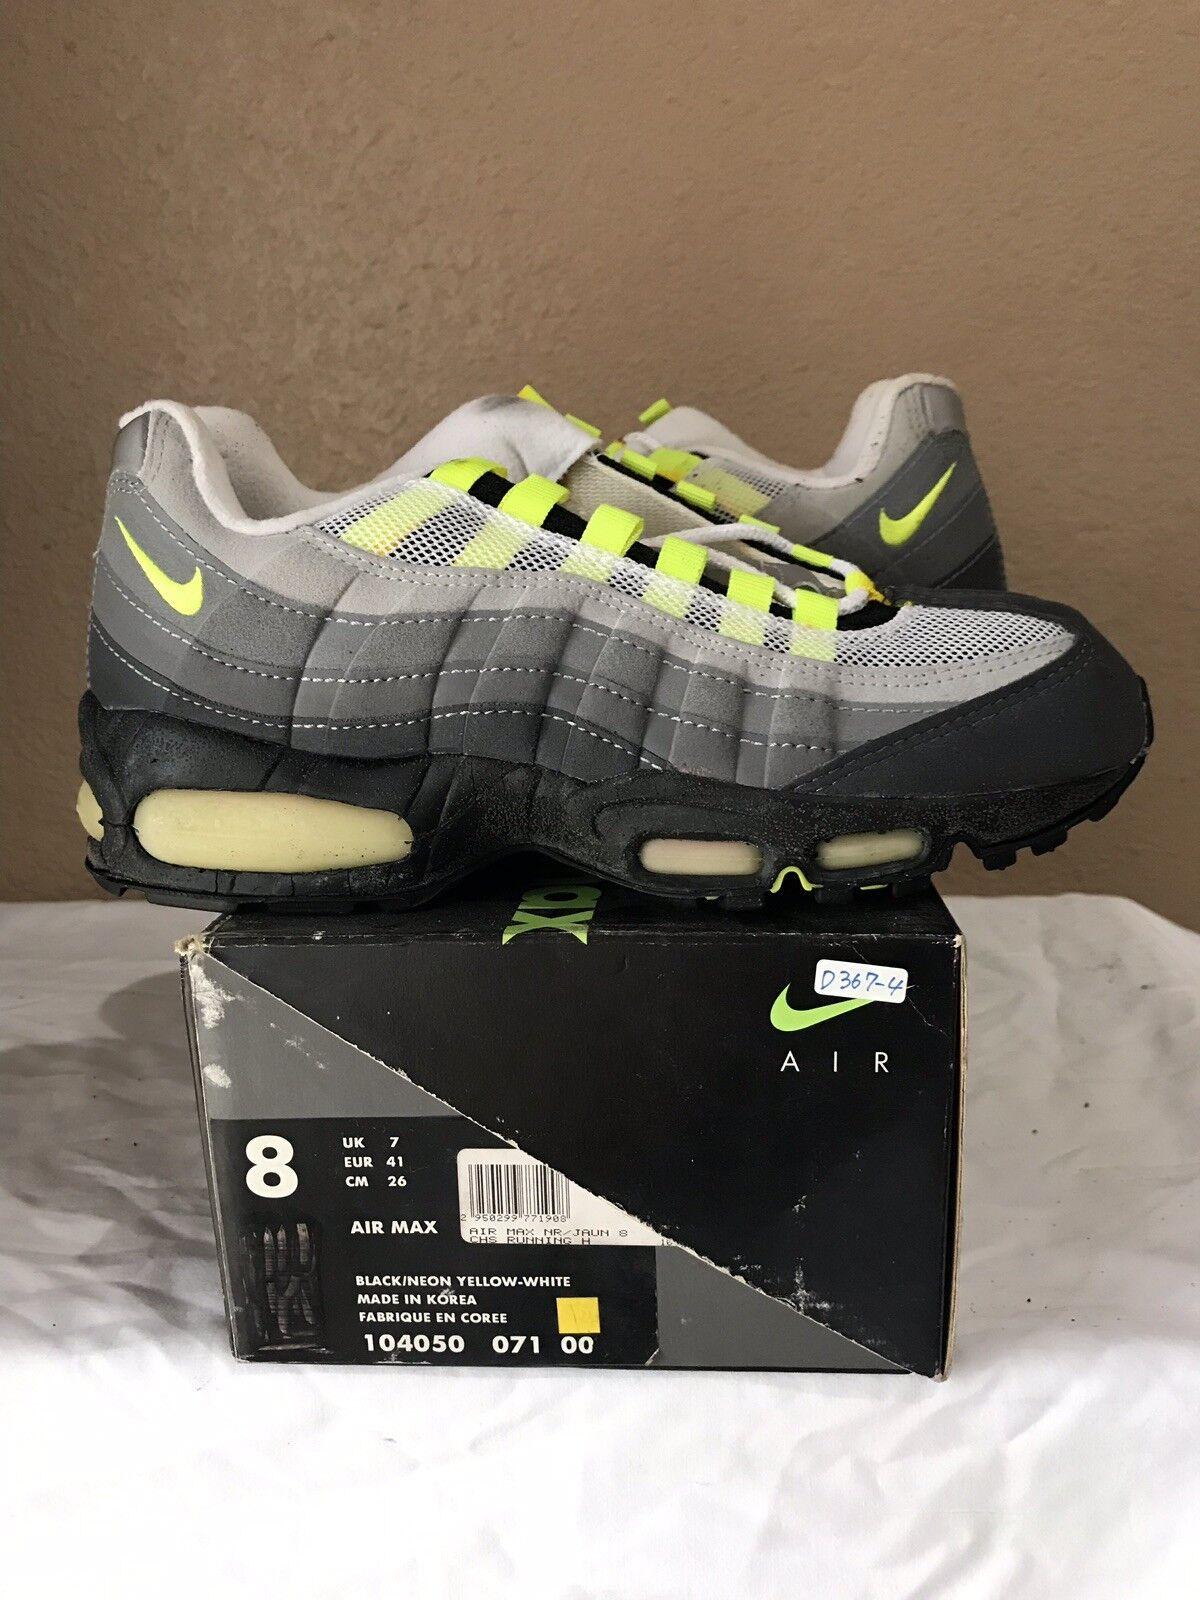 DS 1995 Nike Air Max 95 OG Original Size 8 Black Neon Yellow White 96 98 99 97